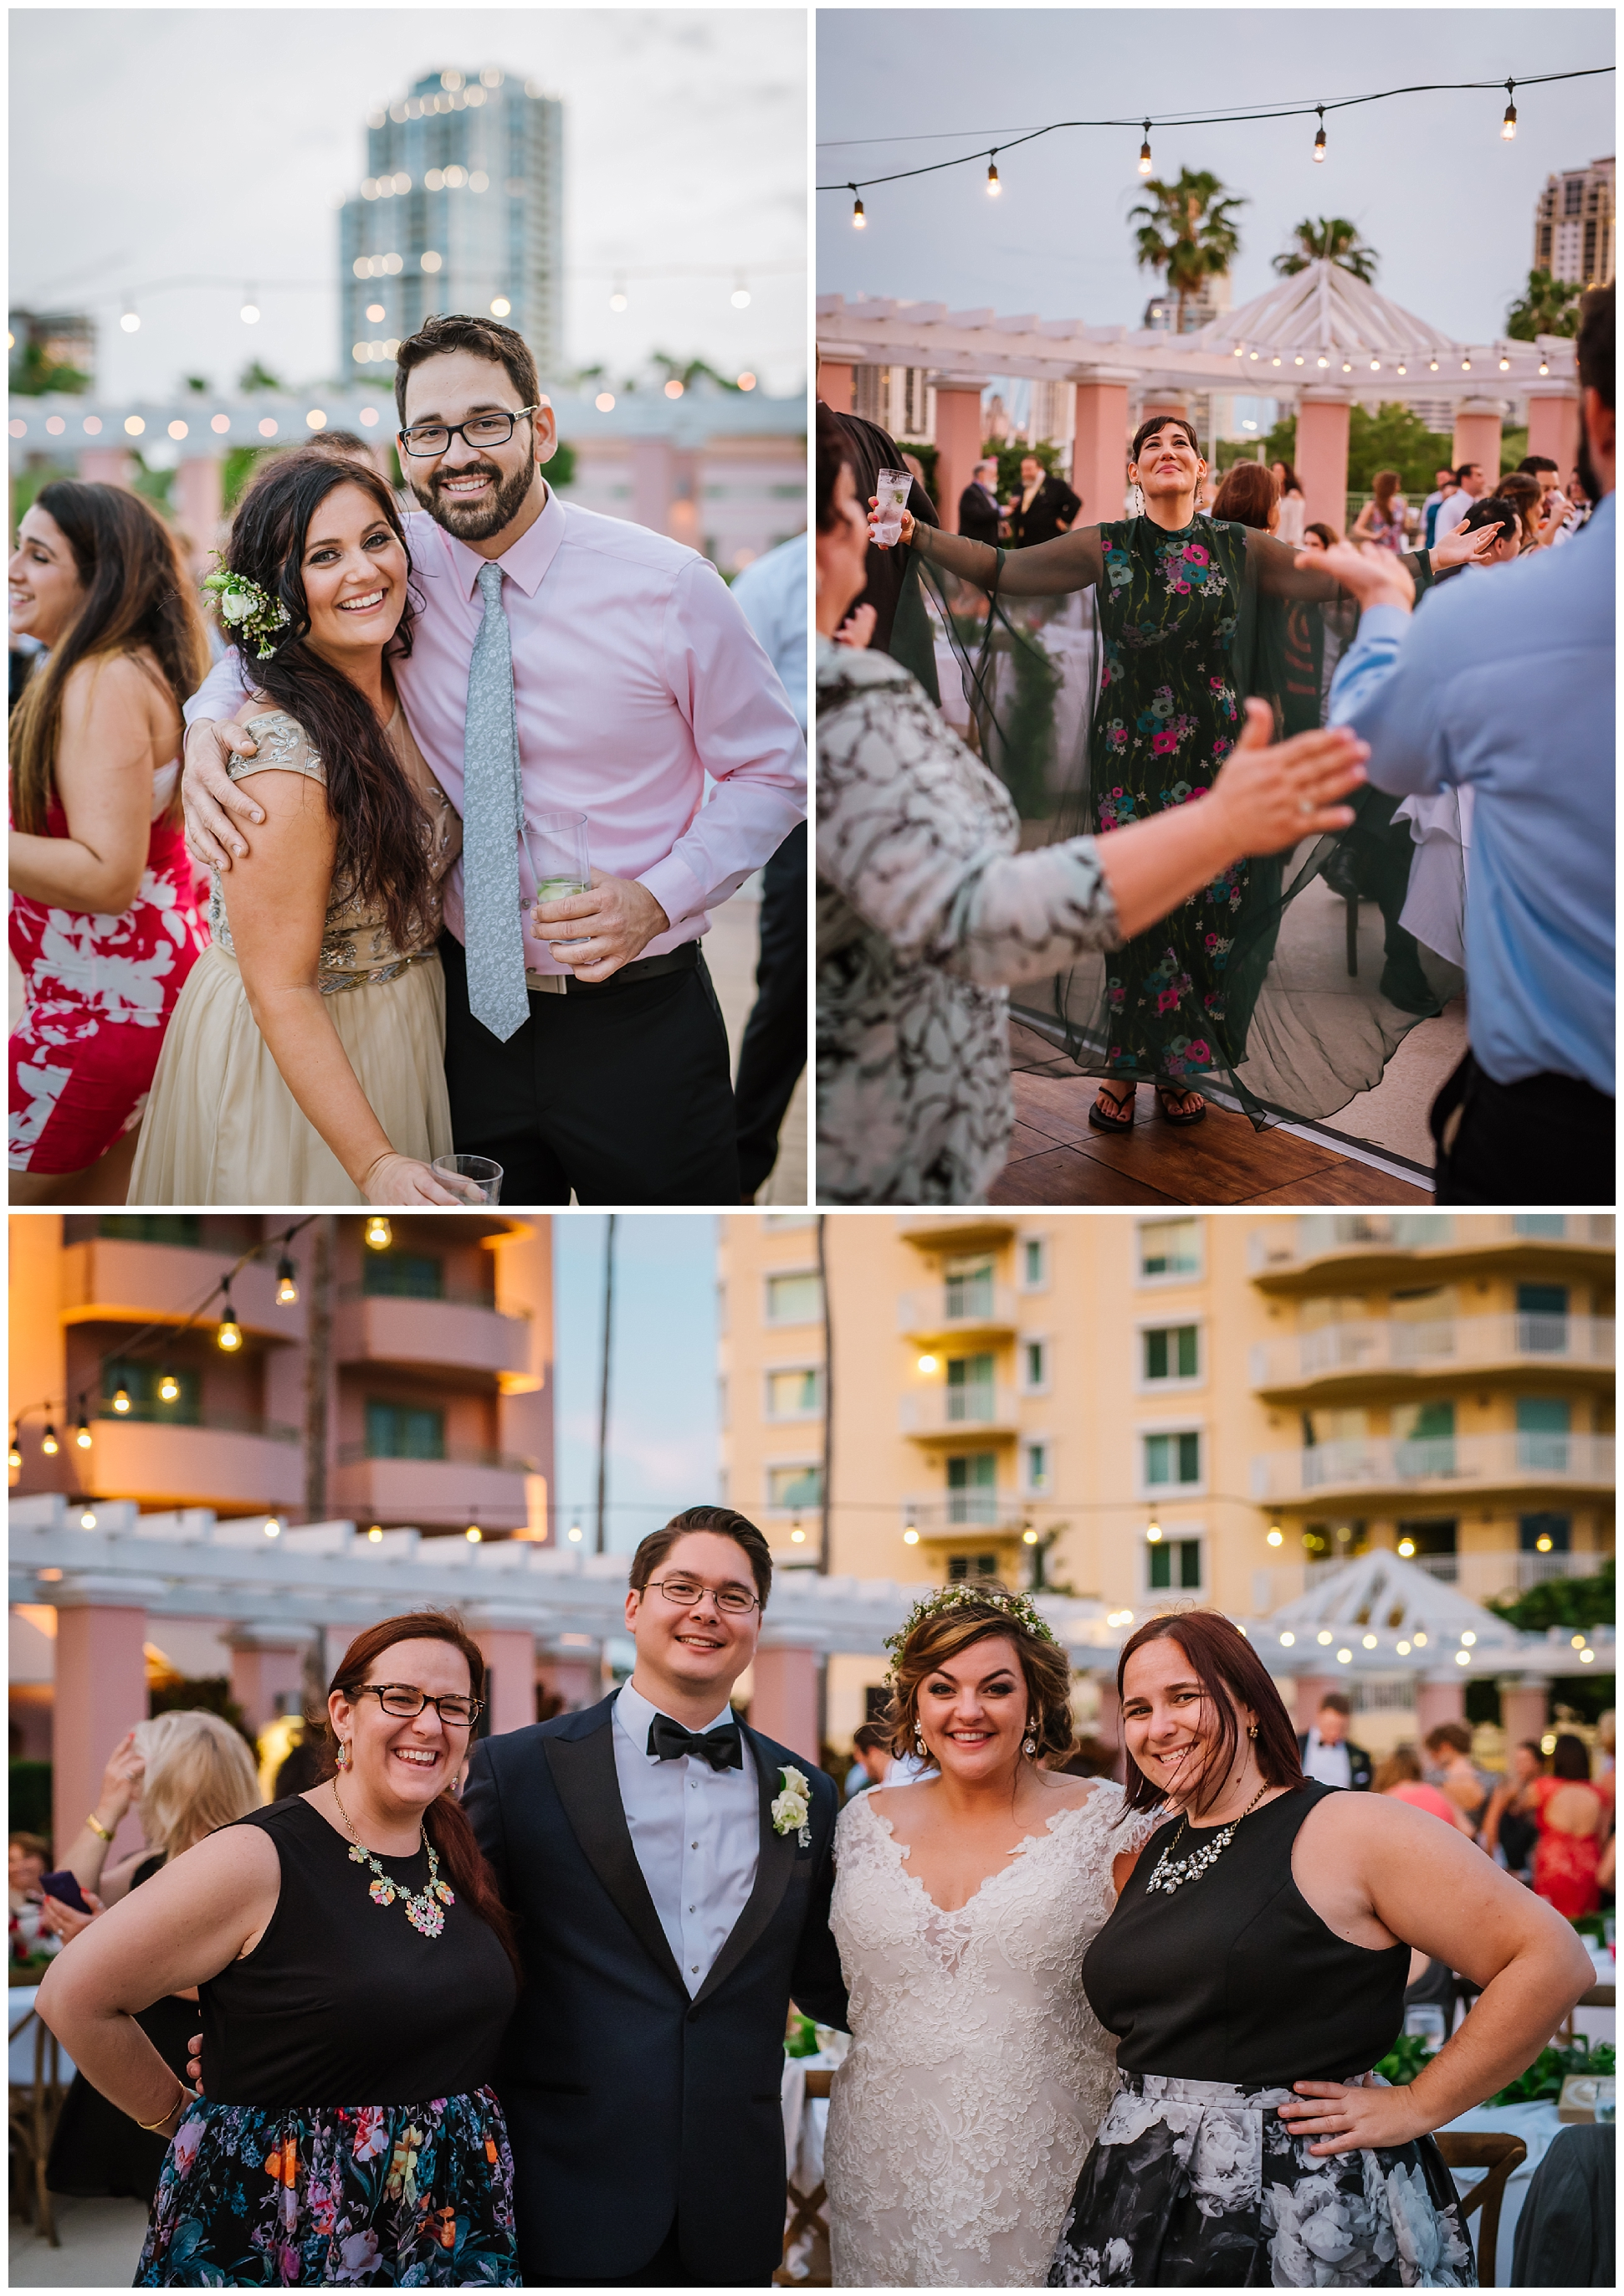 st-pete-wedding-photographer-italian-romance-theme-rustic-flower-crown_0445.jpg